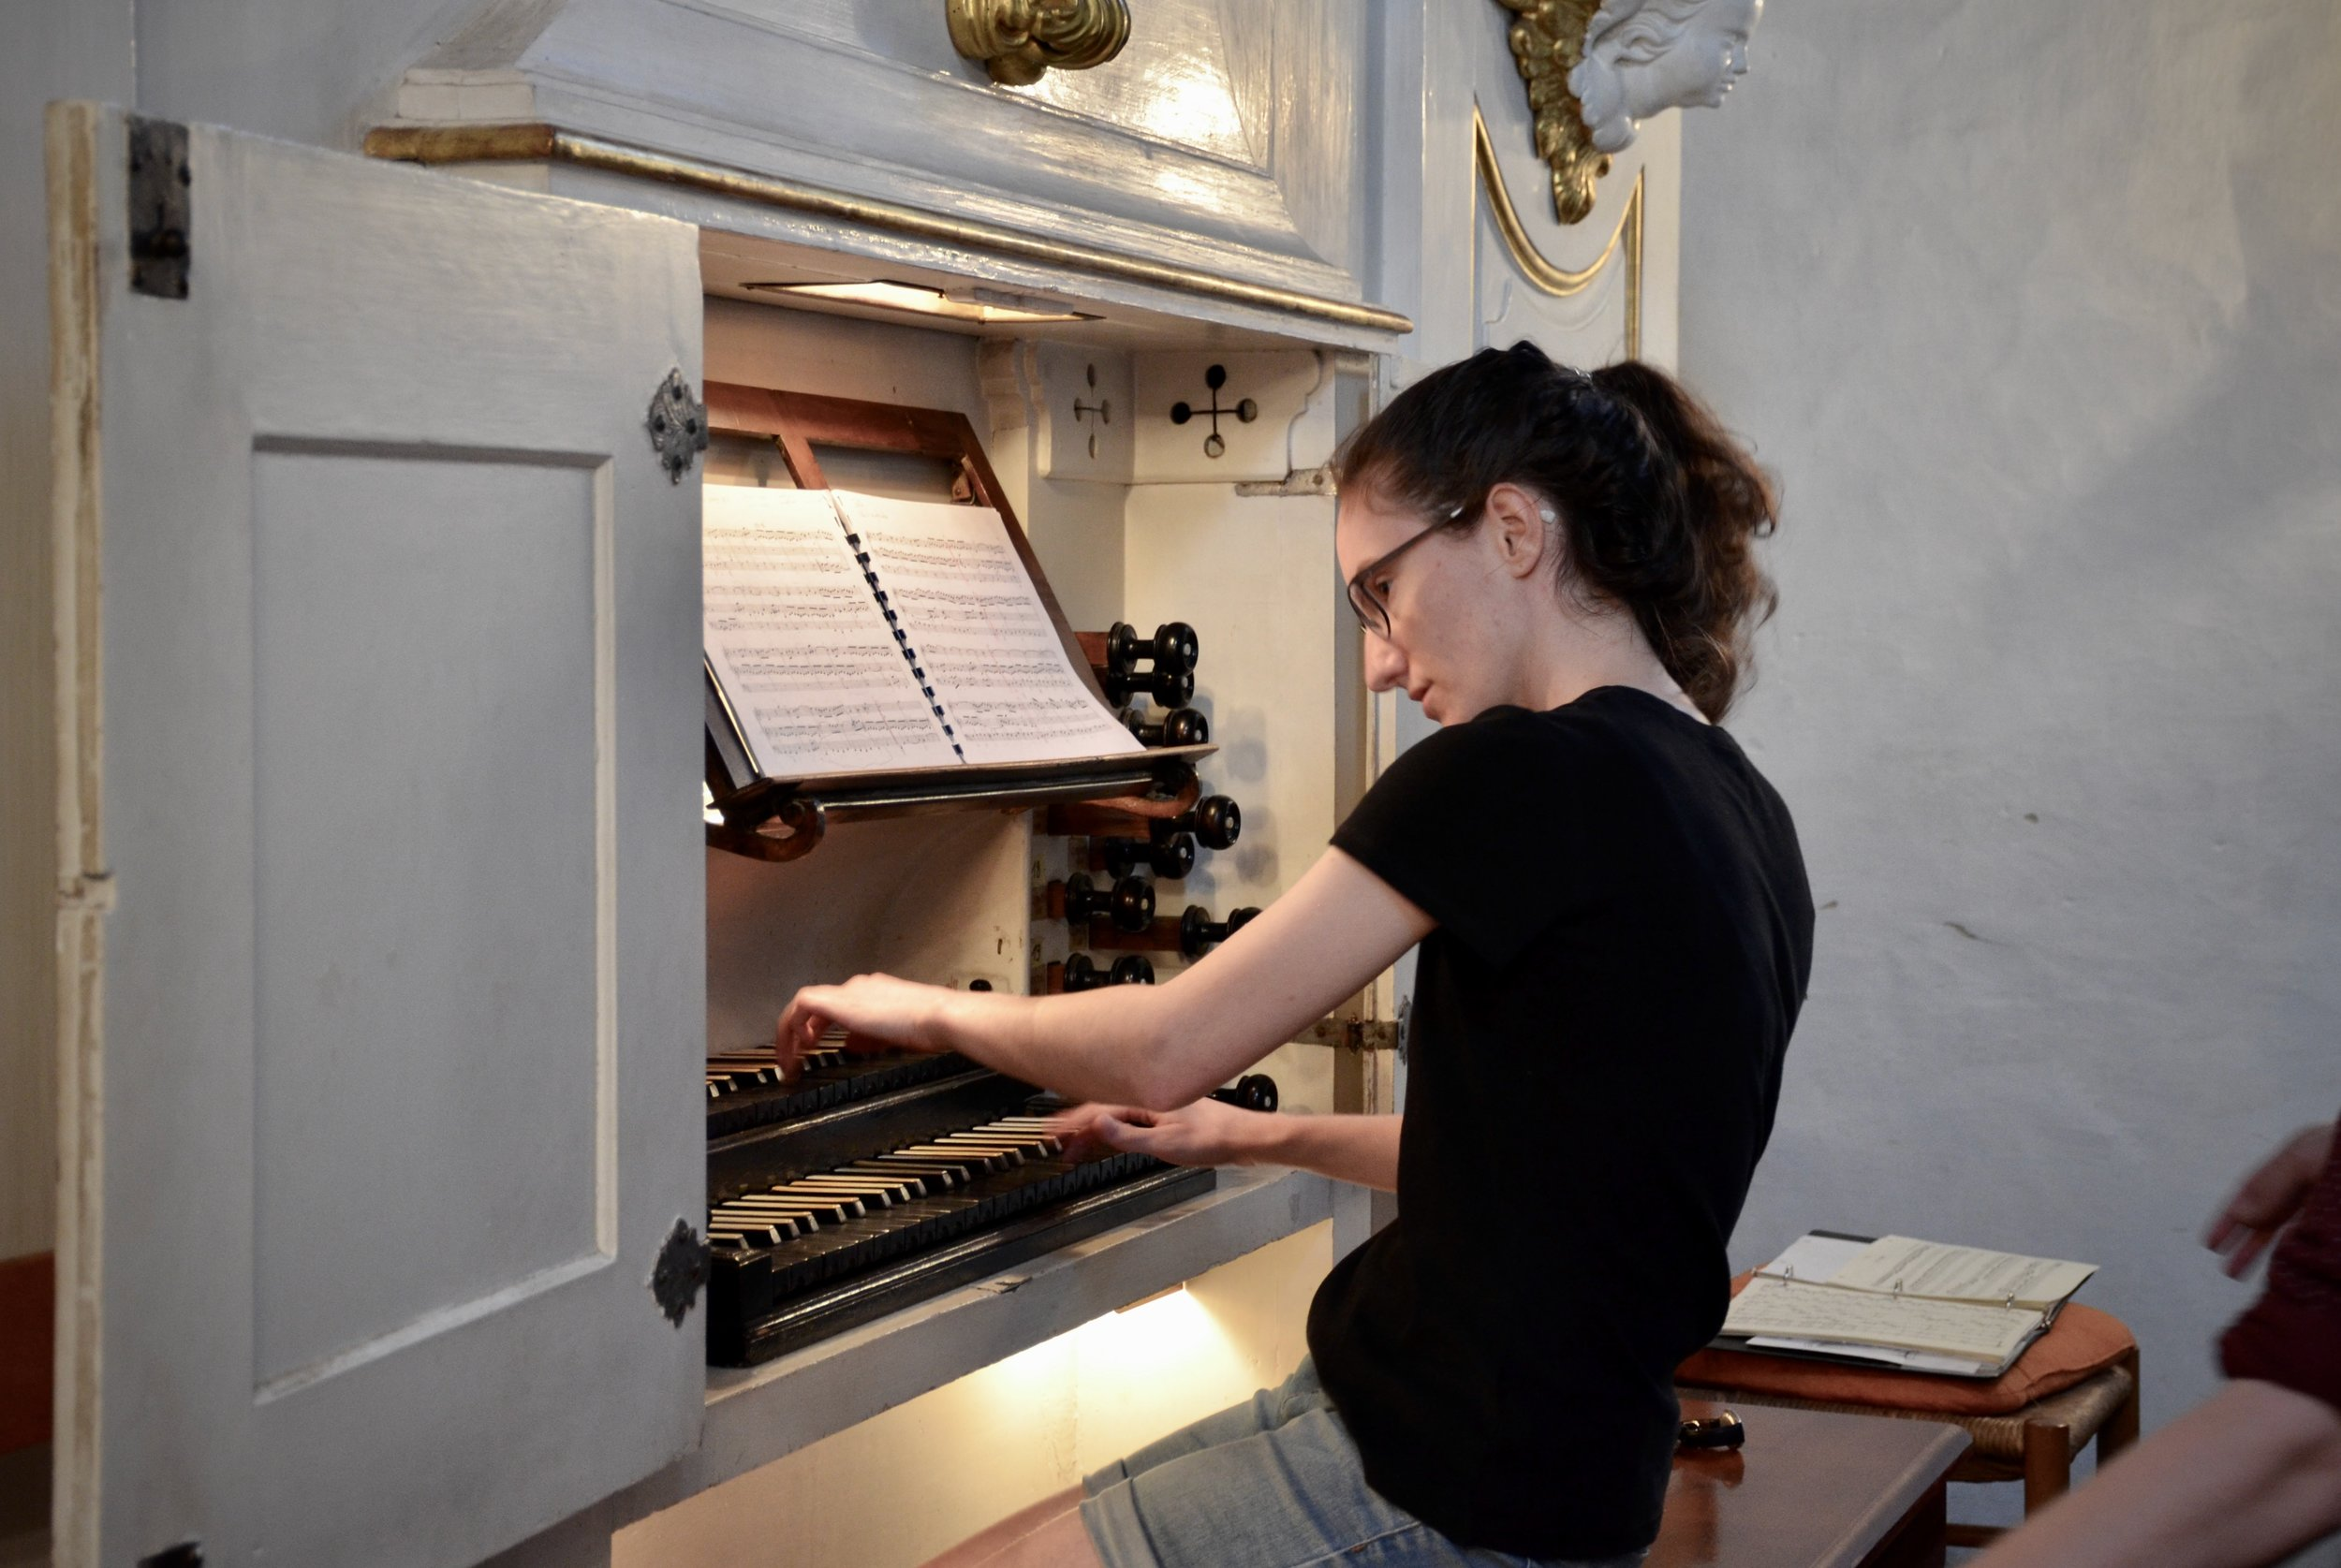 Rosemarie Tougas plays the 1722 Gottfried Silbermann Organ, Killianskirche, Bad Lausick